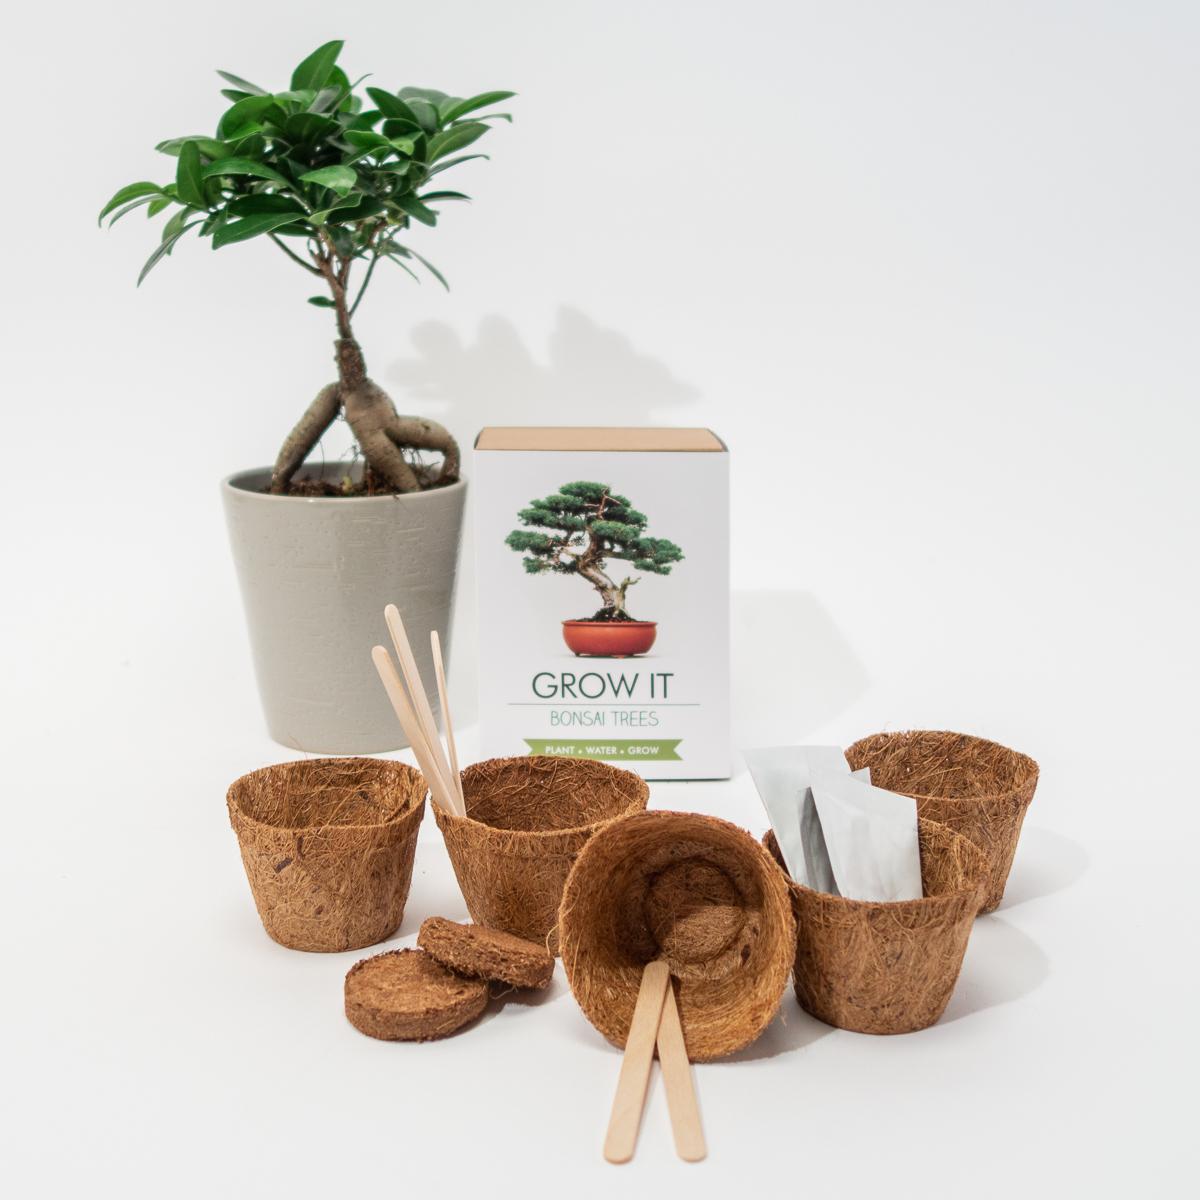 Grow It Bonsai Bäume